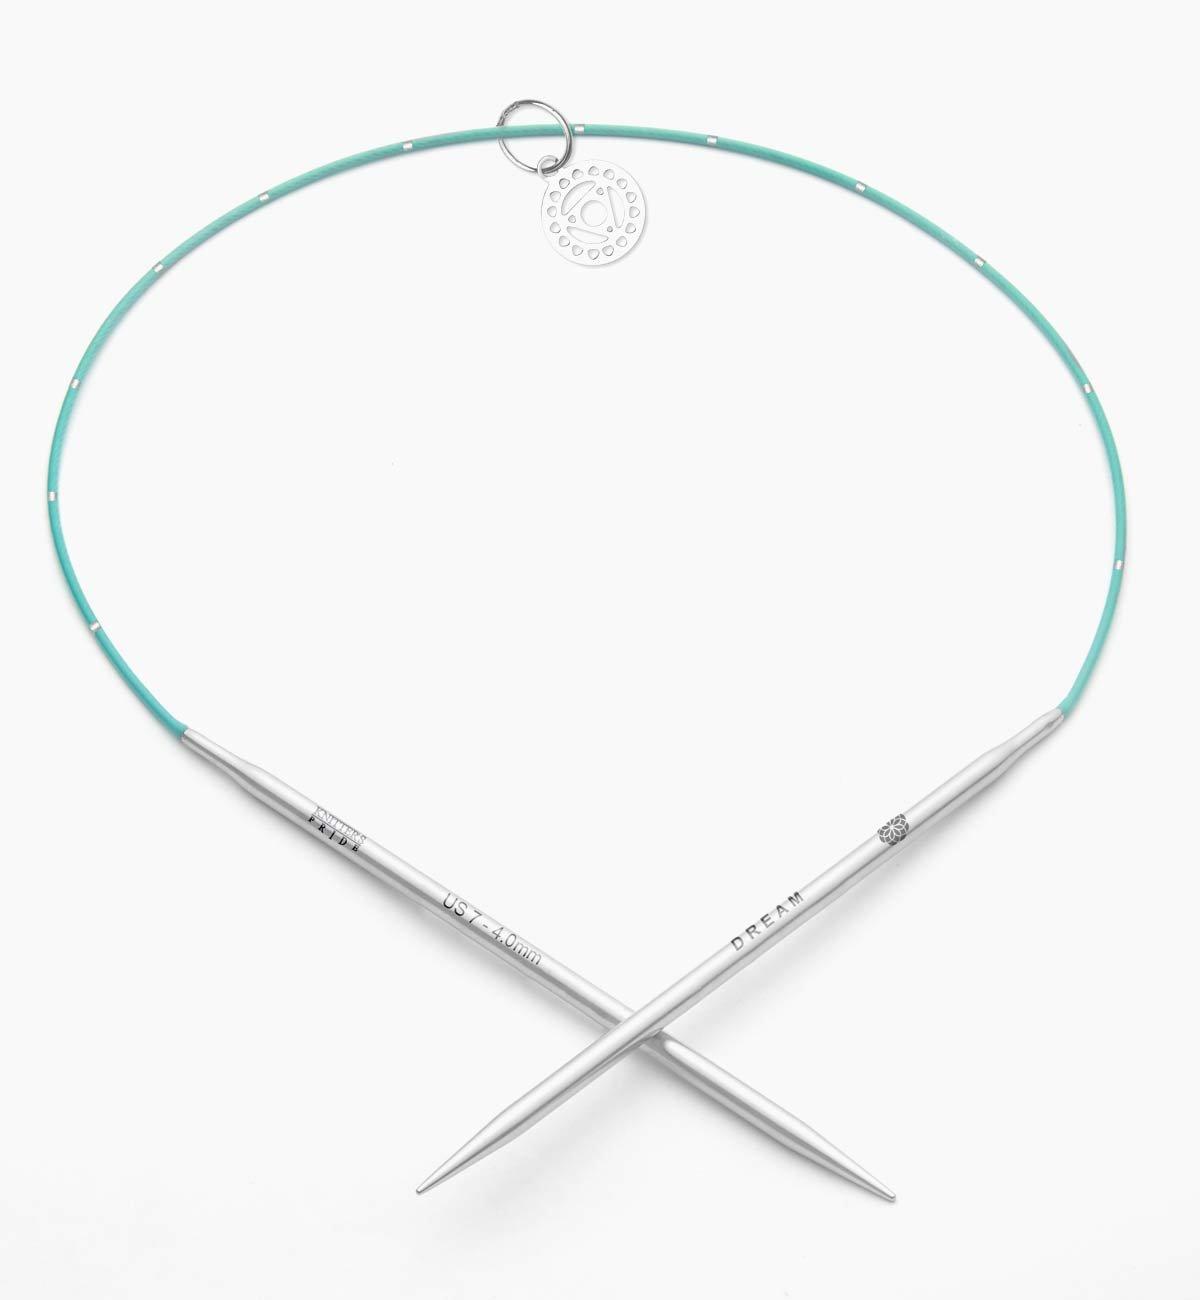 Mindful Lace 40 Circular Needles